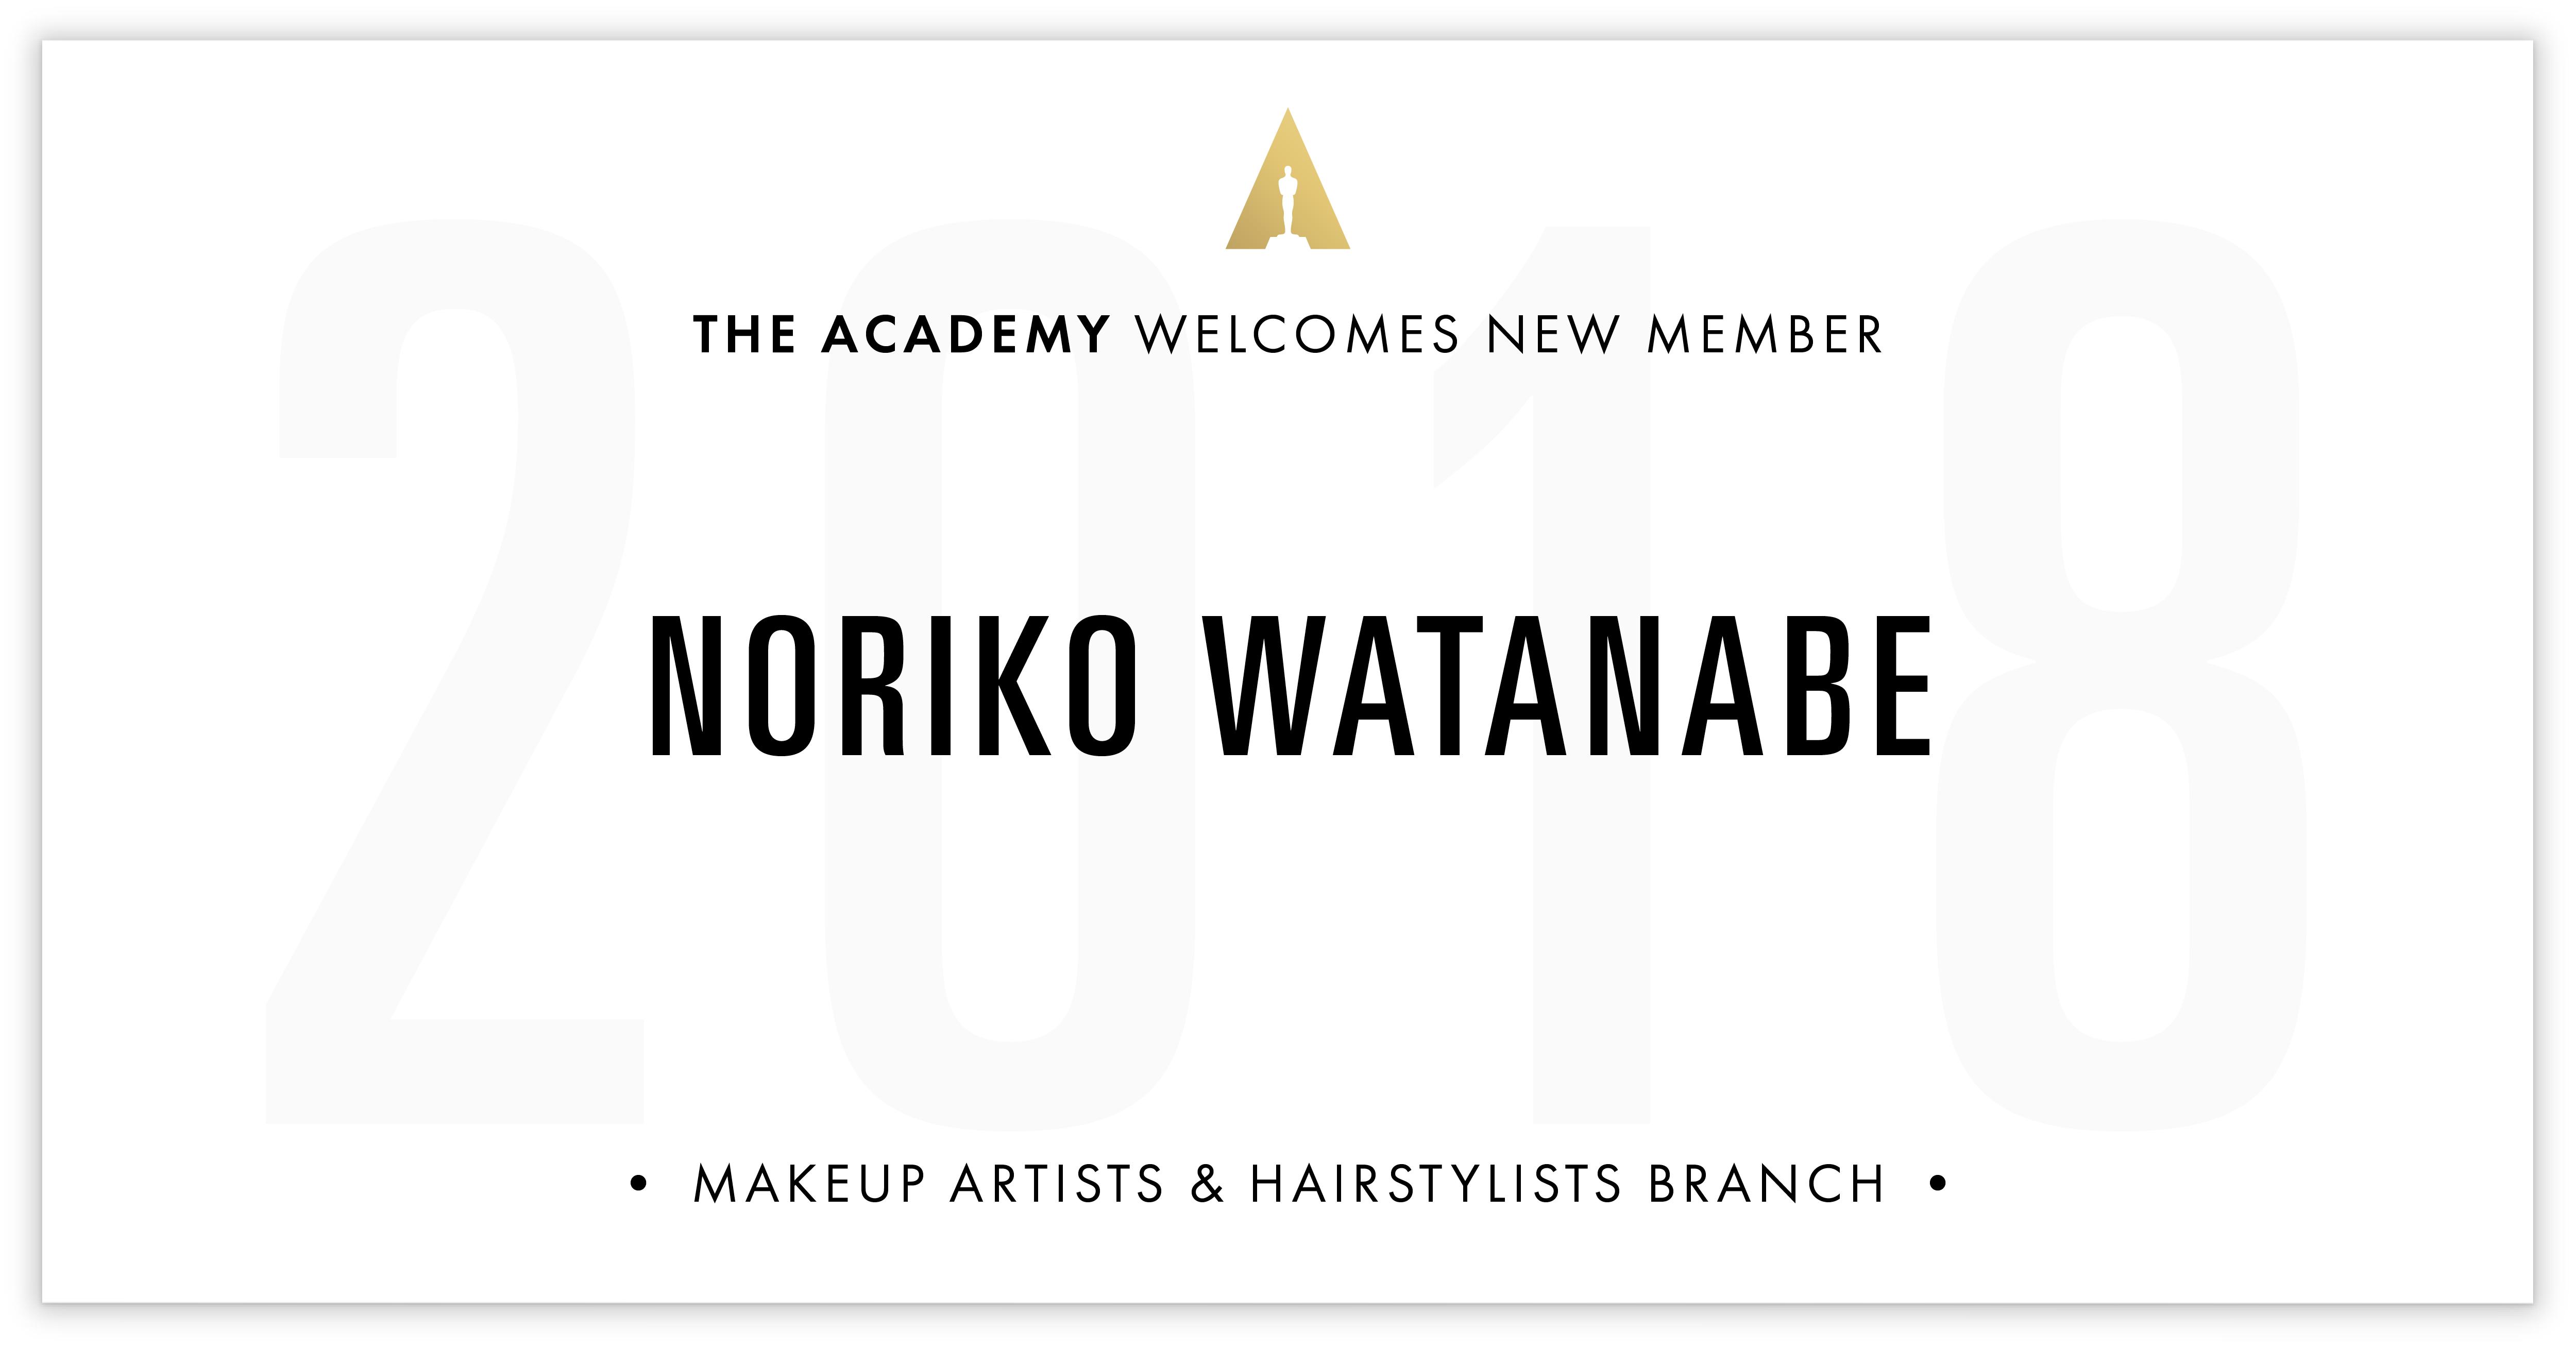 Noriko Watanabe is invited!